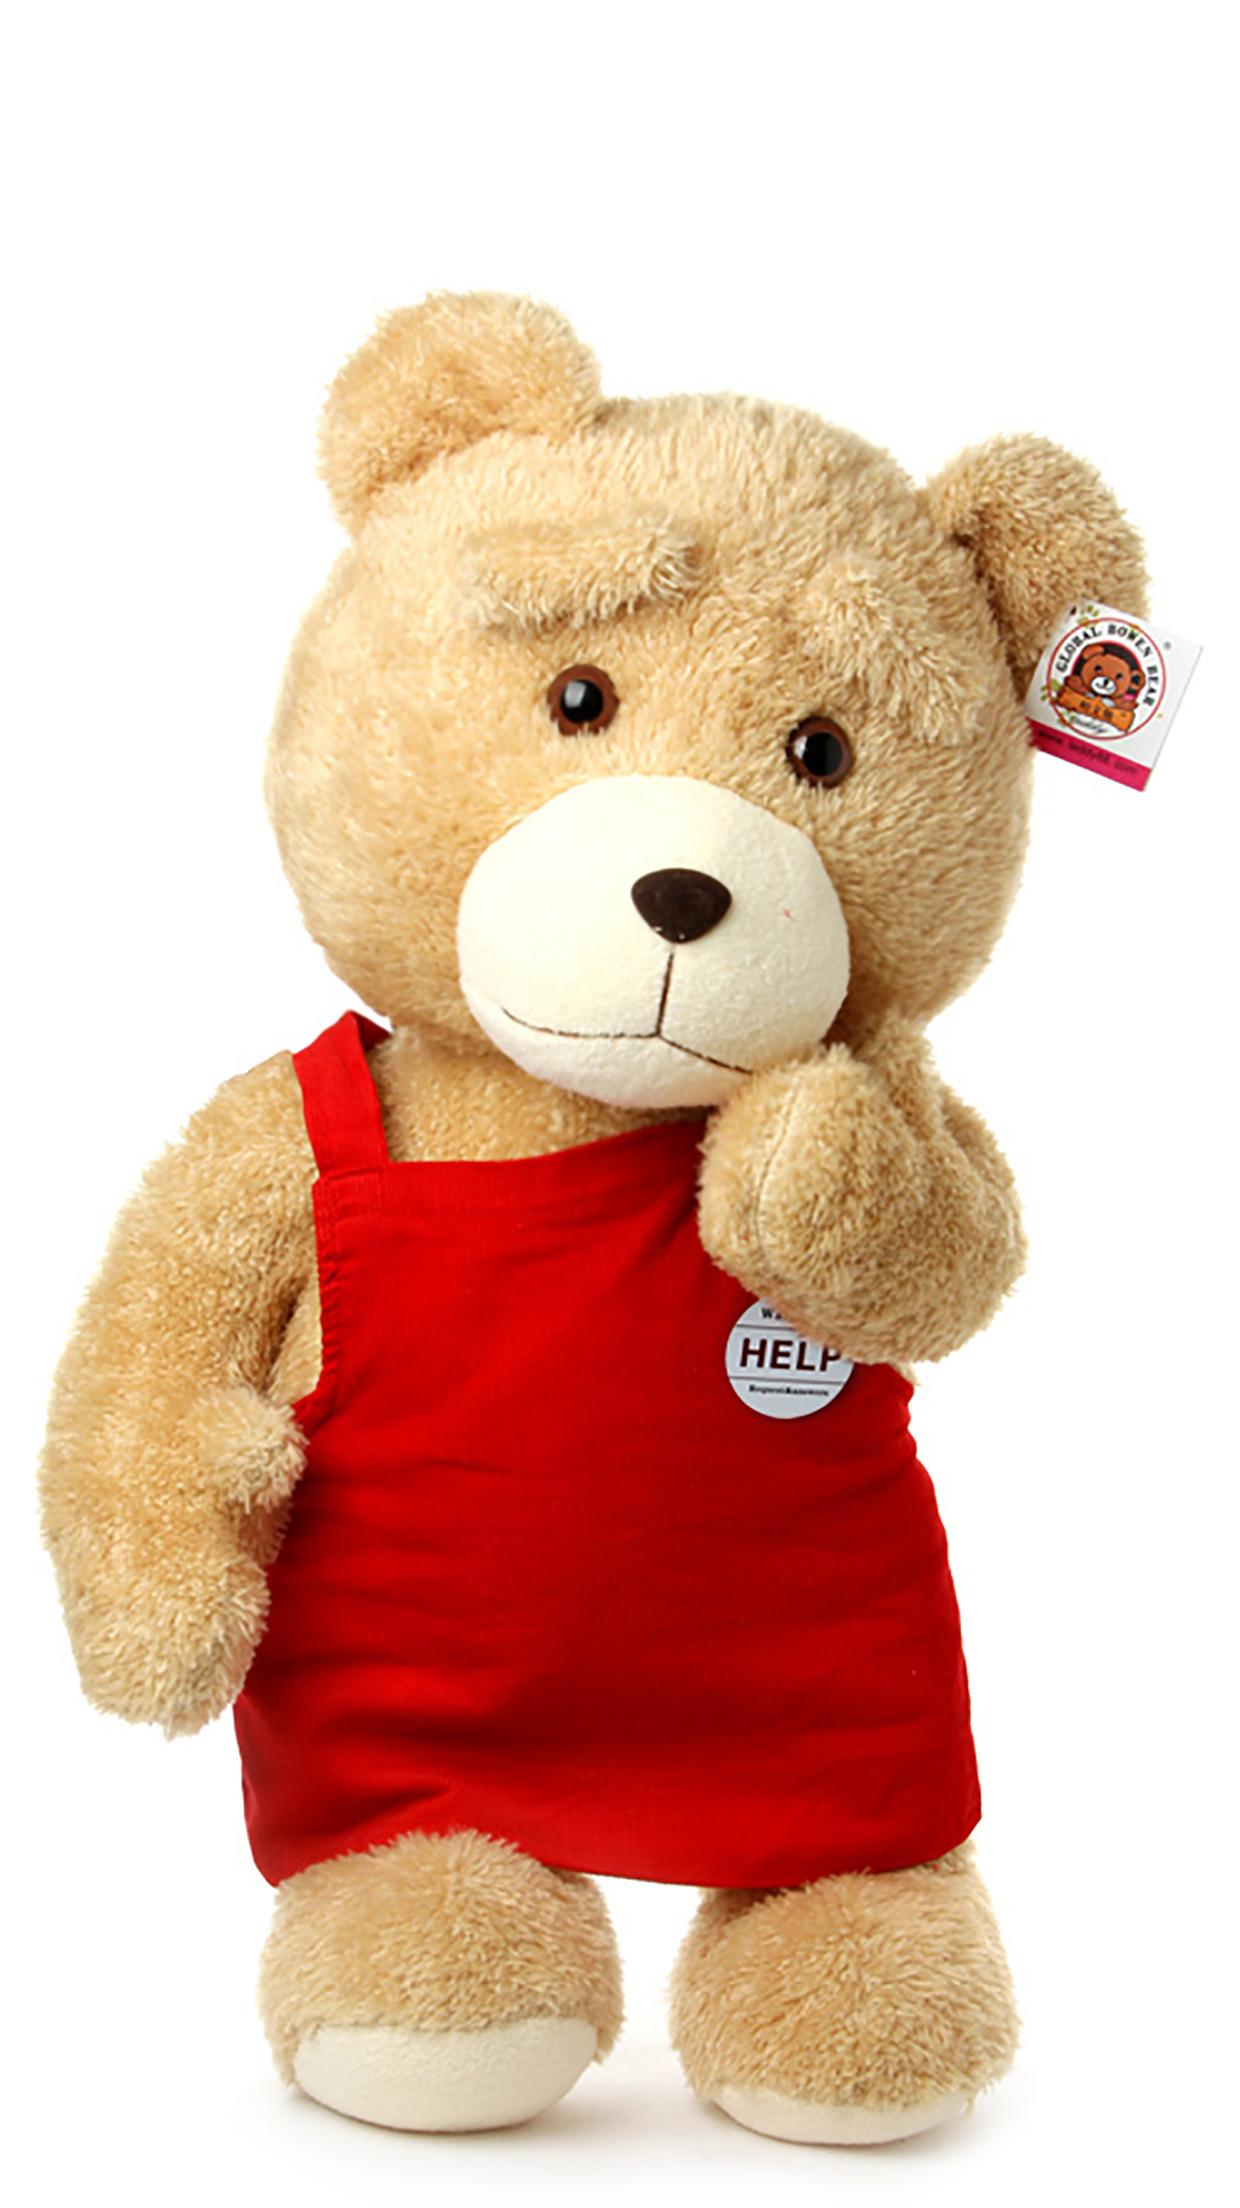 Teddy Bear Sad 3Wallpapers iPhone Parallax Teddy Bear : Sad